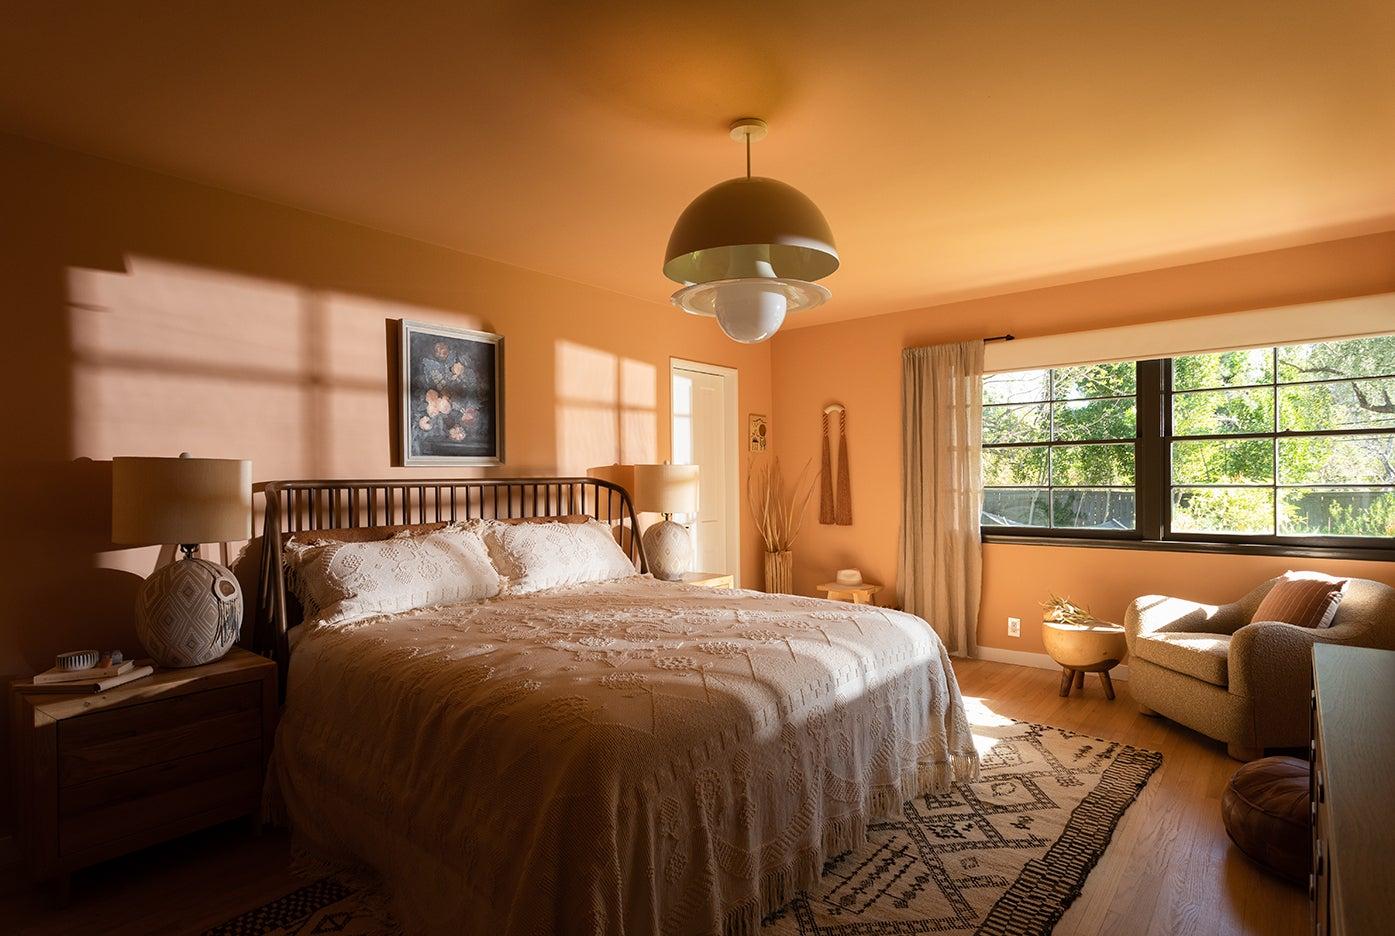 peach bedroom walls